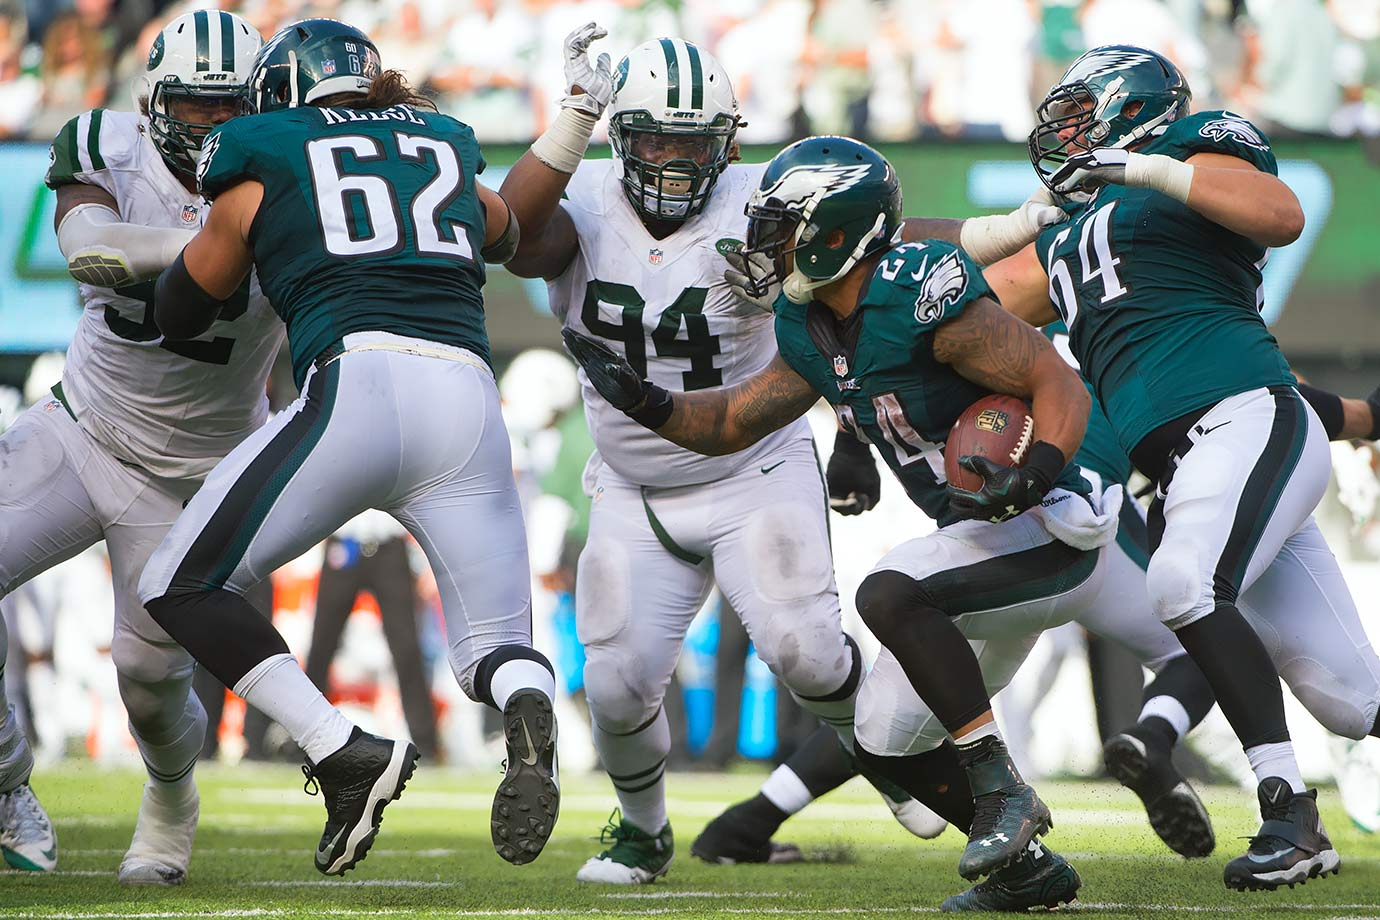 2015 Team: New York Jets — 2016 Team: New York Giants